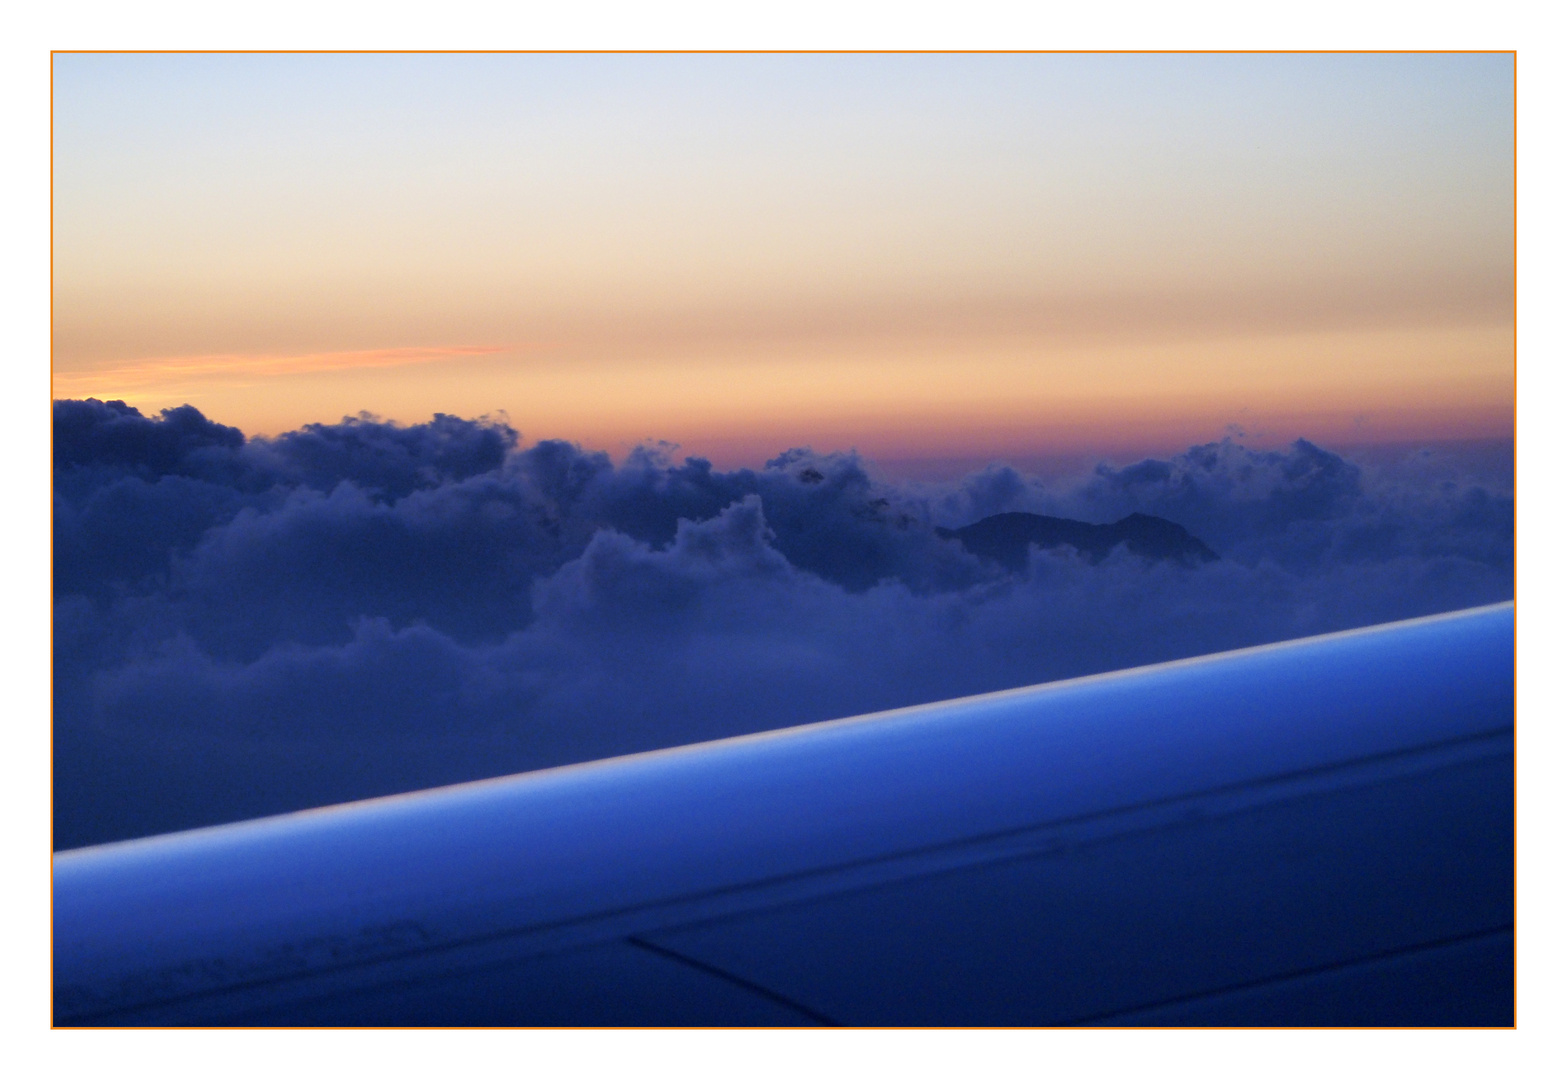 Landeanflug auf Palma die Mallorca